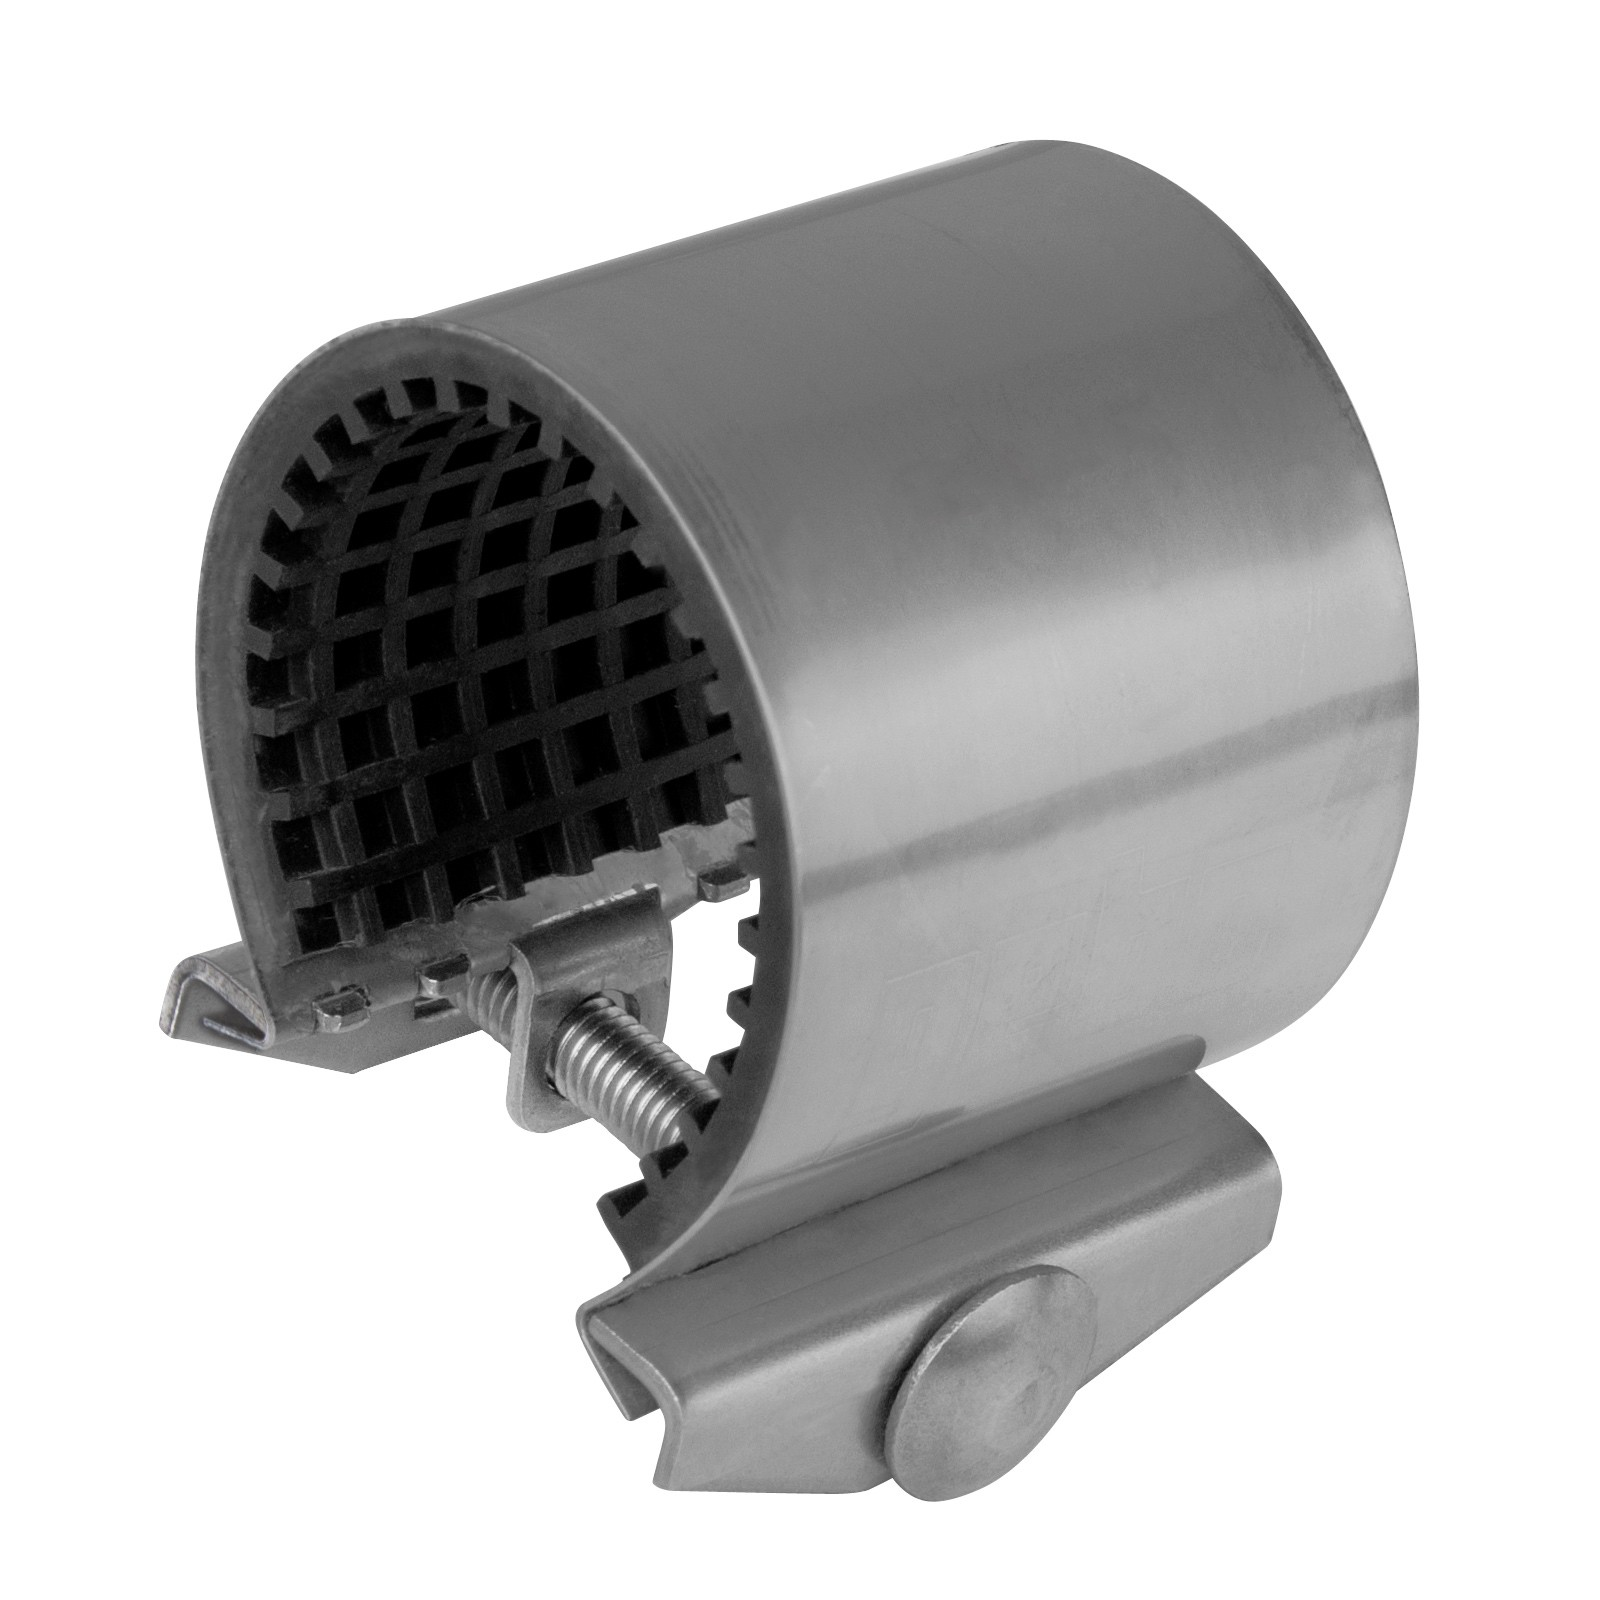 Edelstahl Rohr Dichtband / Dichtschelle 48-51 mm 1 1/2 Zoll Unifix